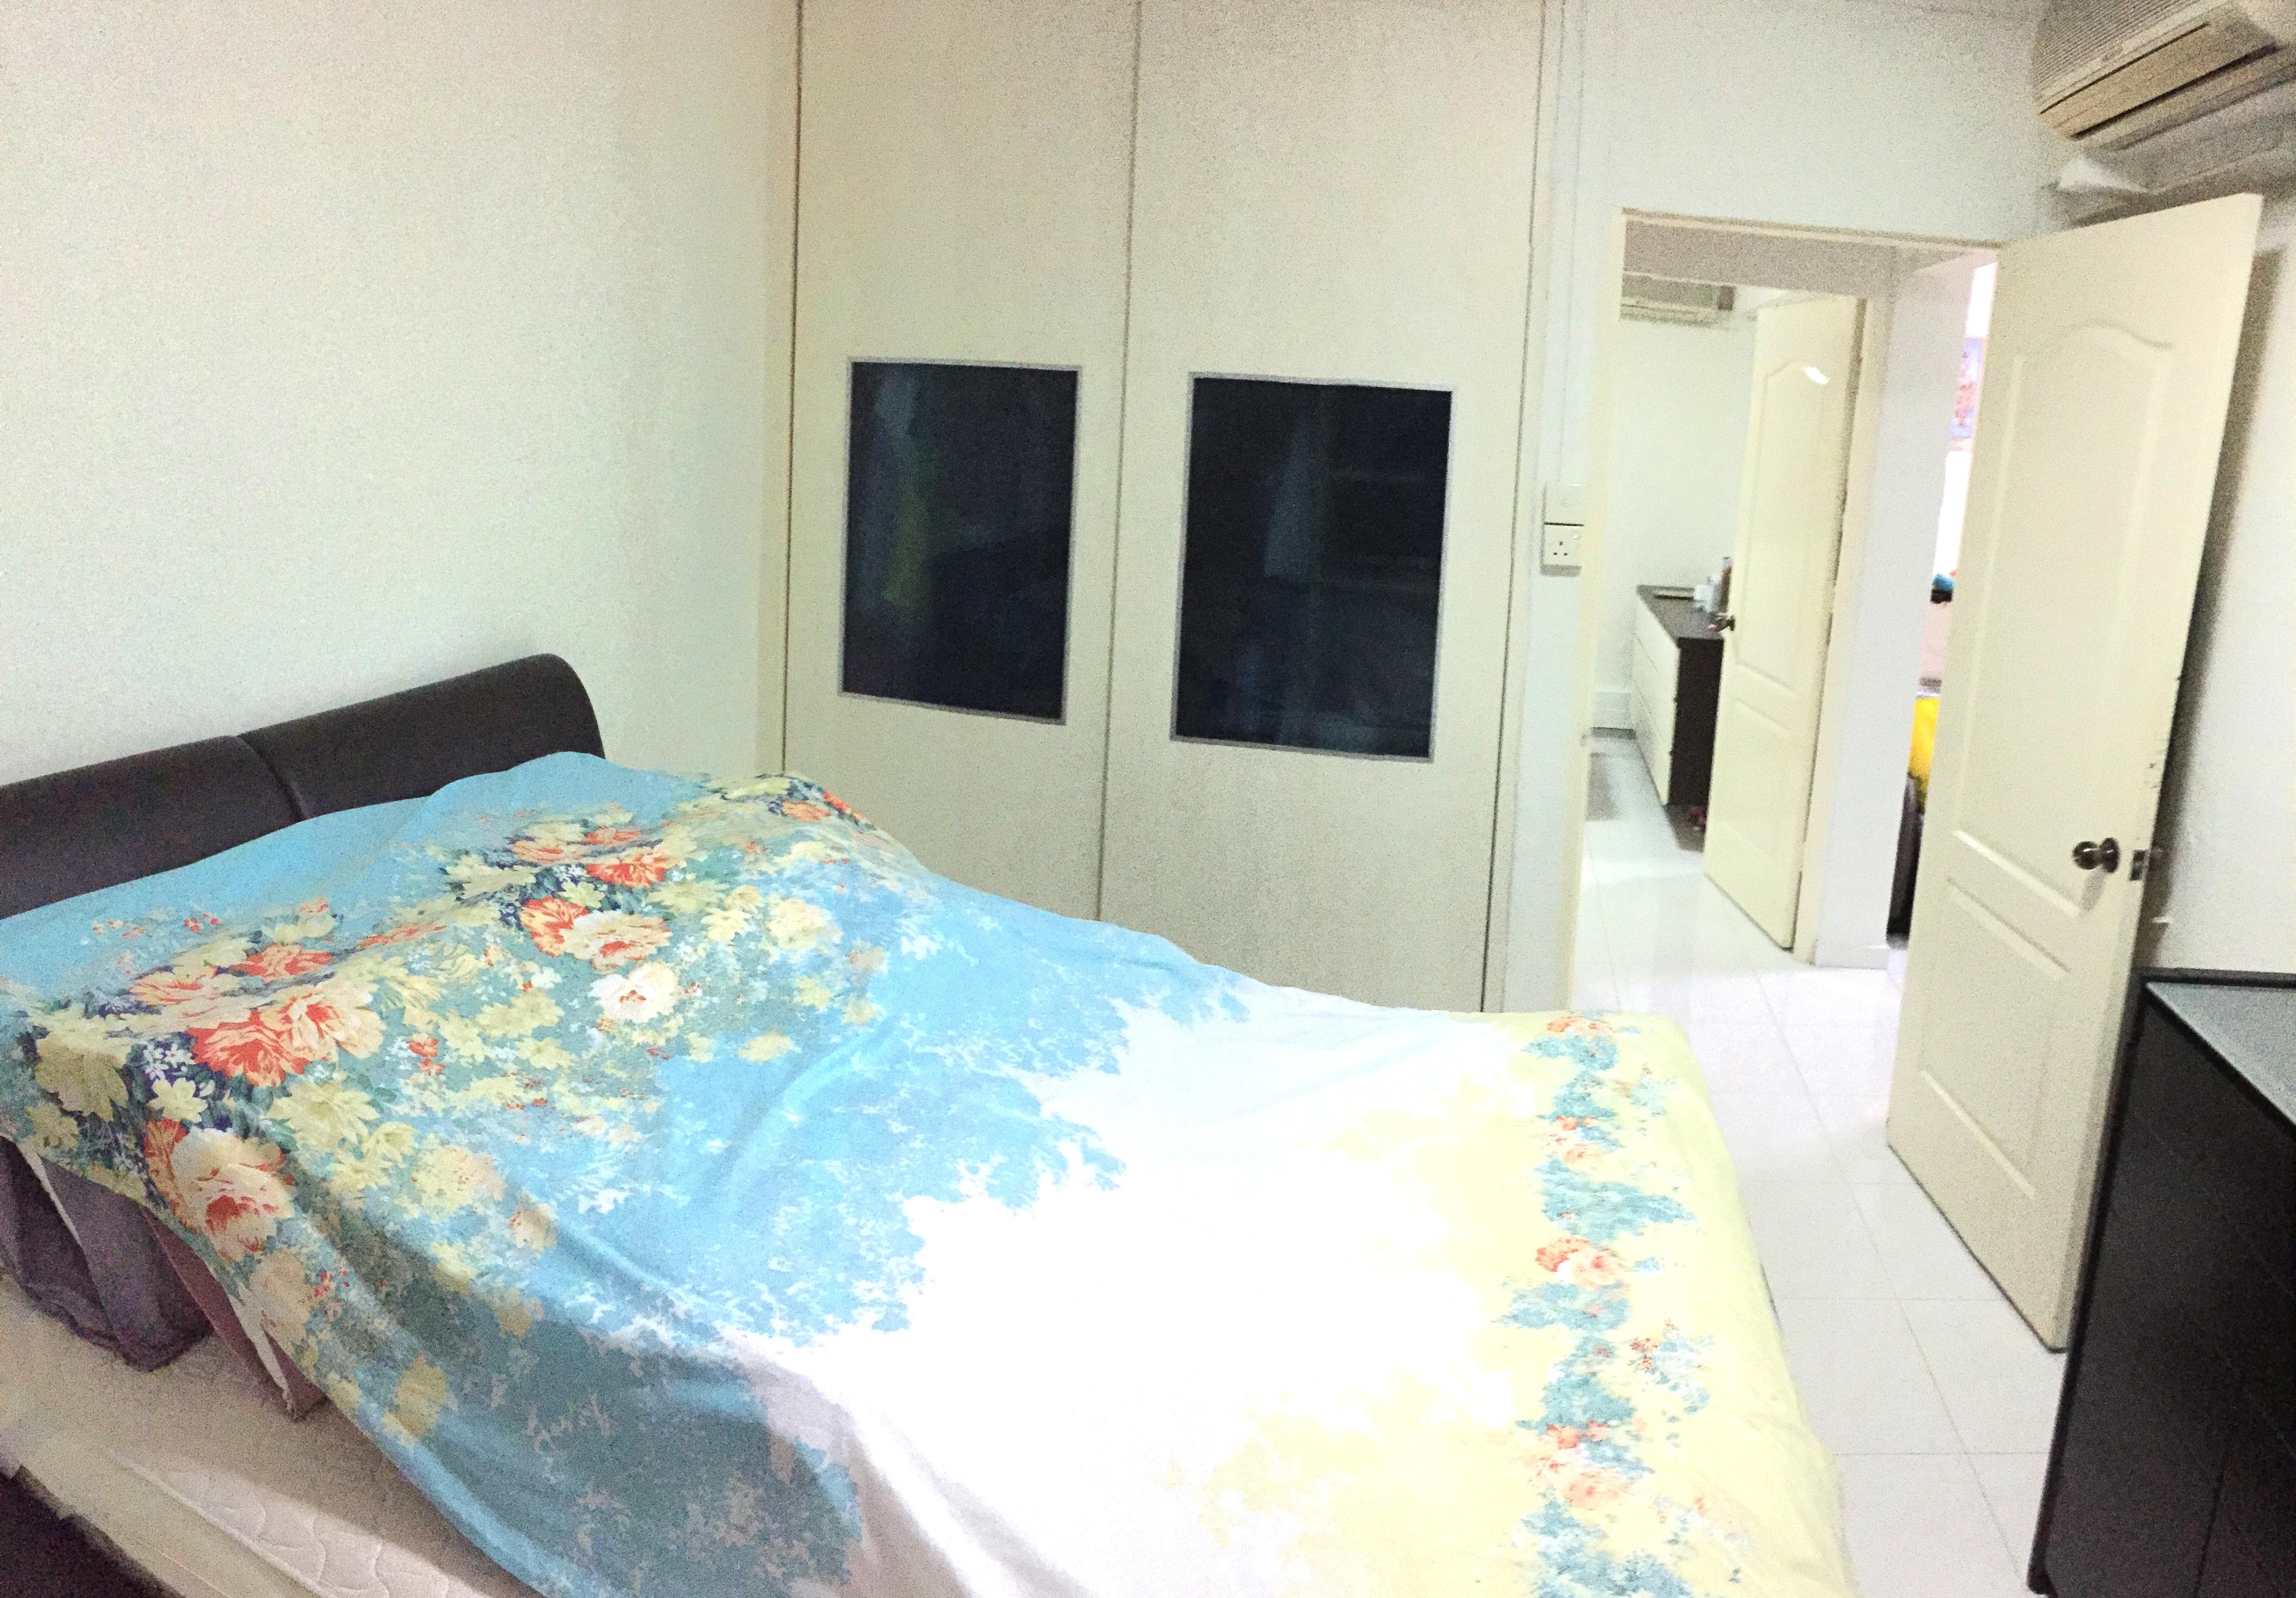 6 Telok Blangah Crescent 6 Telok Blangah Crescent 2 Bedrooms 699 Sqft Hdb Flats For Rent By